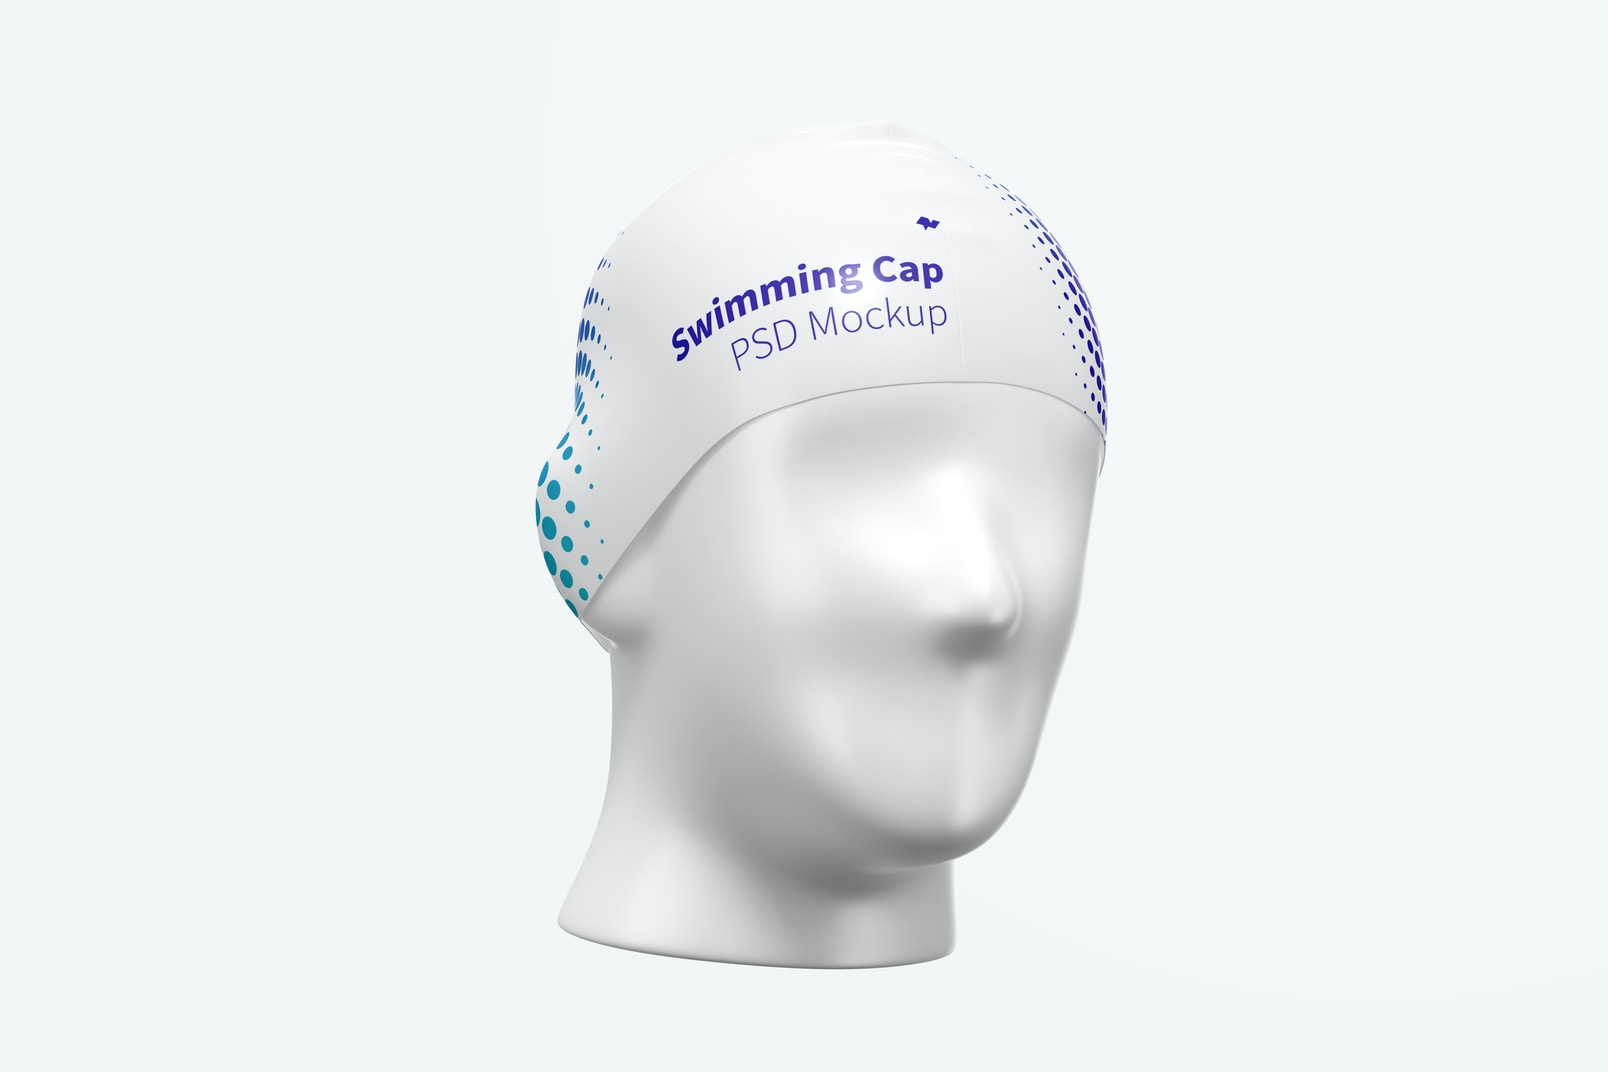 Swimming Cap on Head Mockup